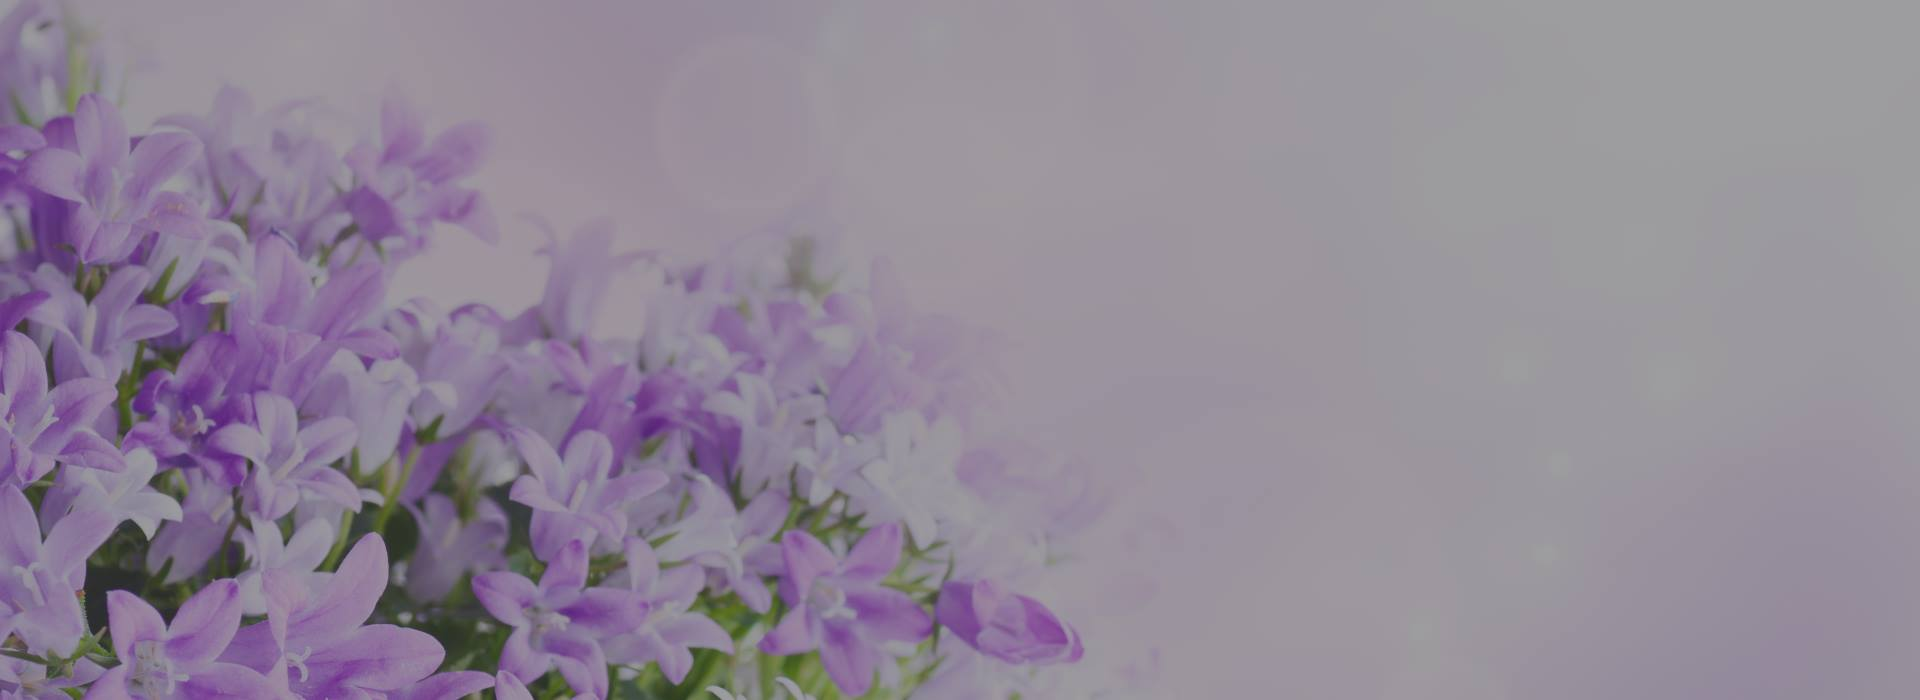 animal-spirit-d-flowers